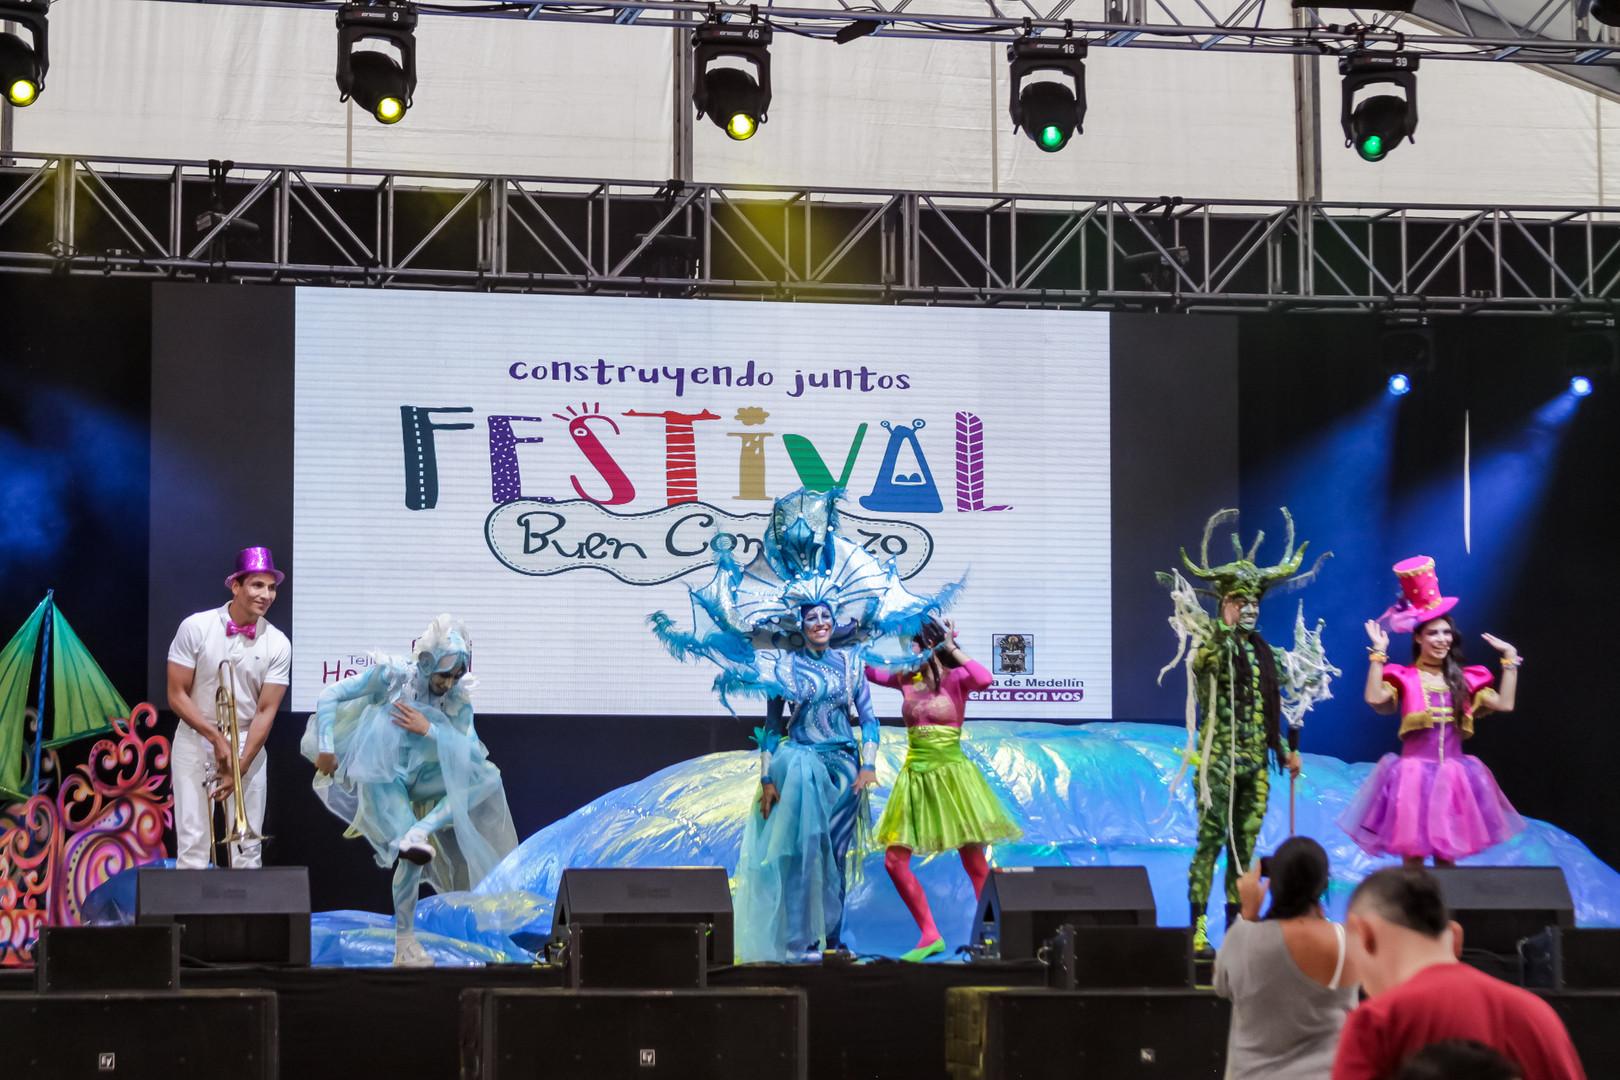 Festival Buen Comienzo Medellín